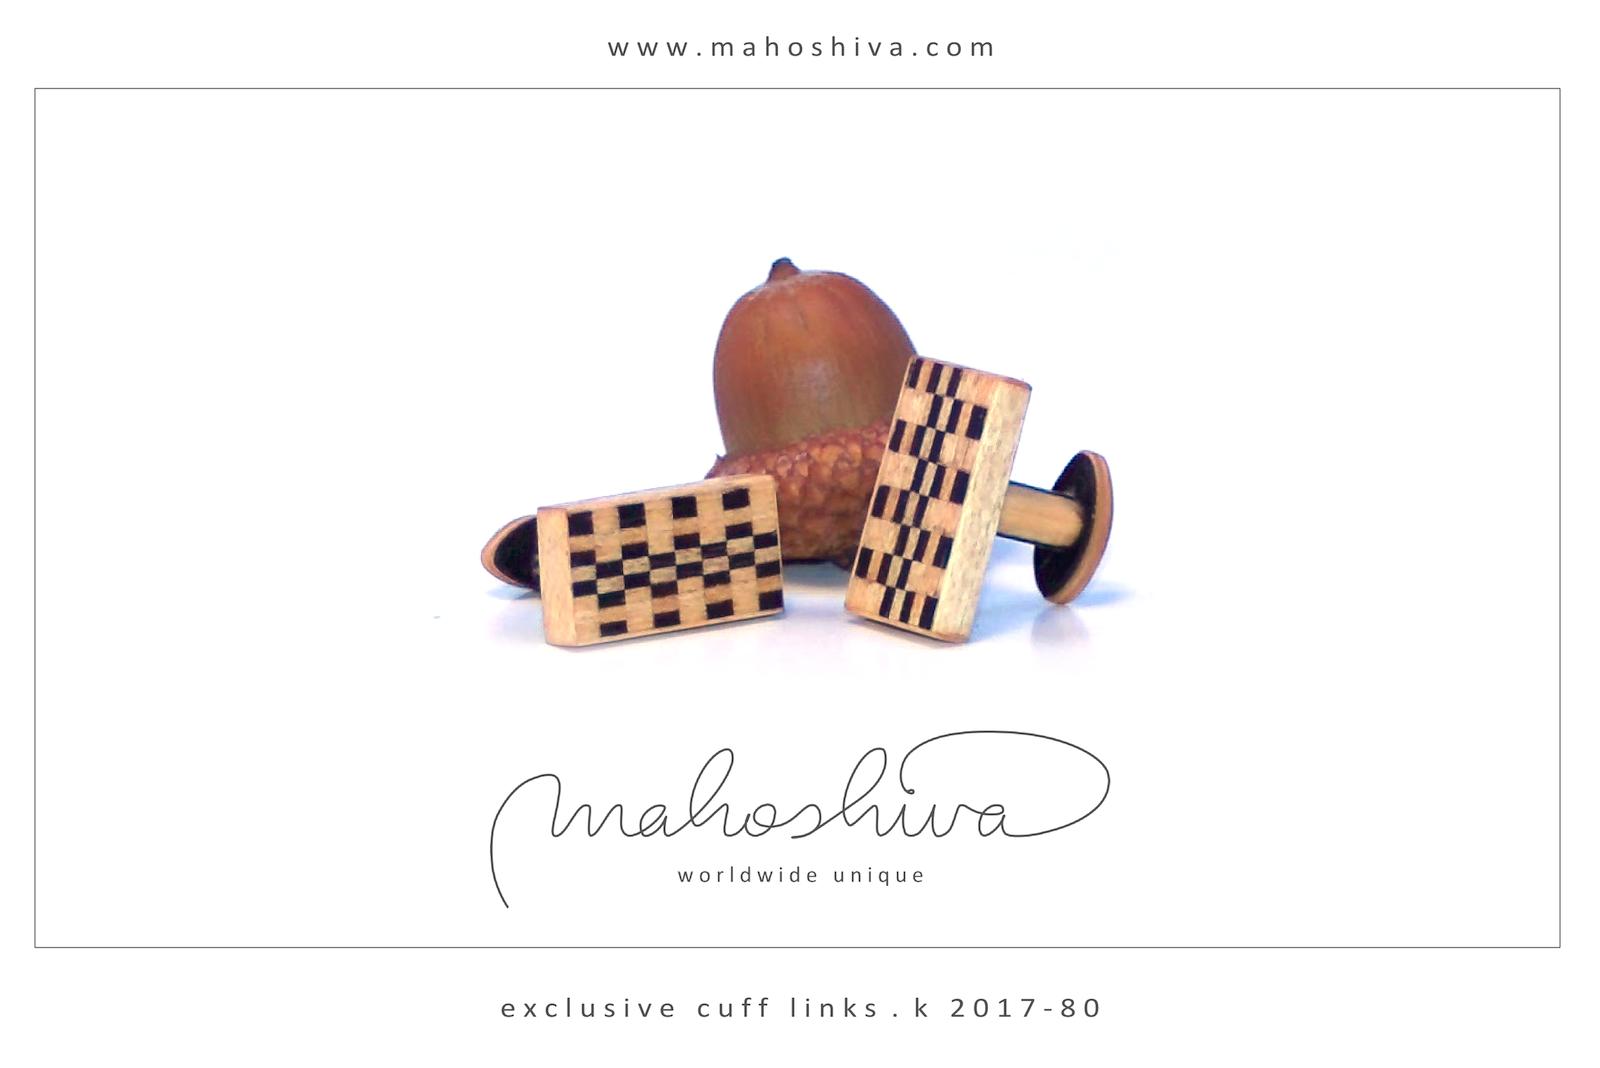 mahoshiva k 2017-80 Manschettenknöpfe aus Holz